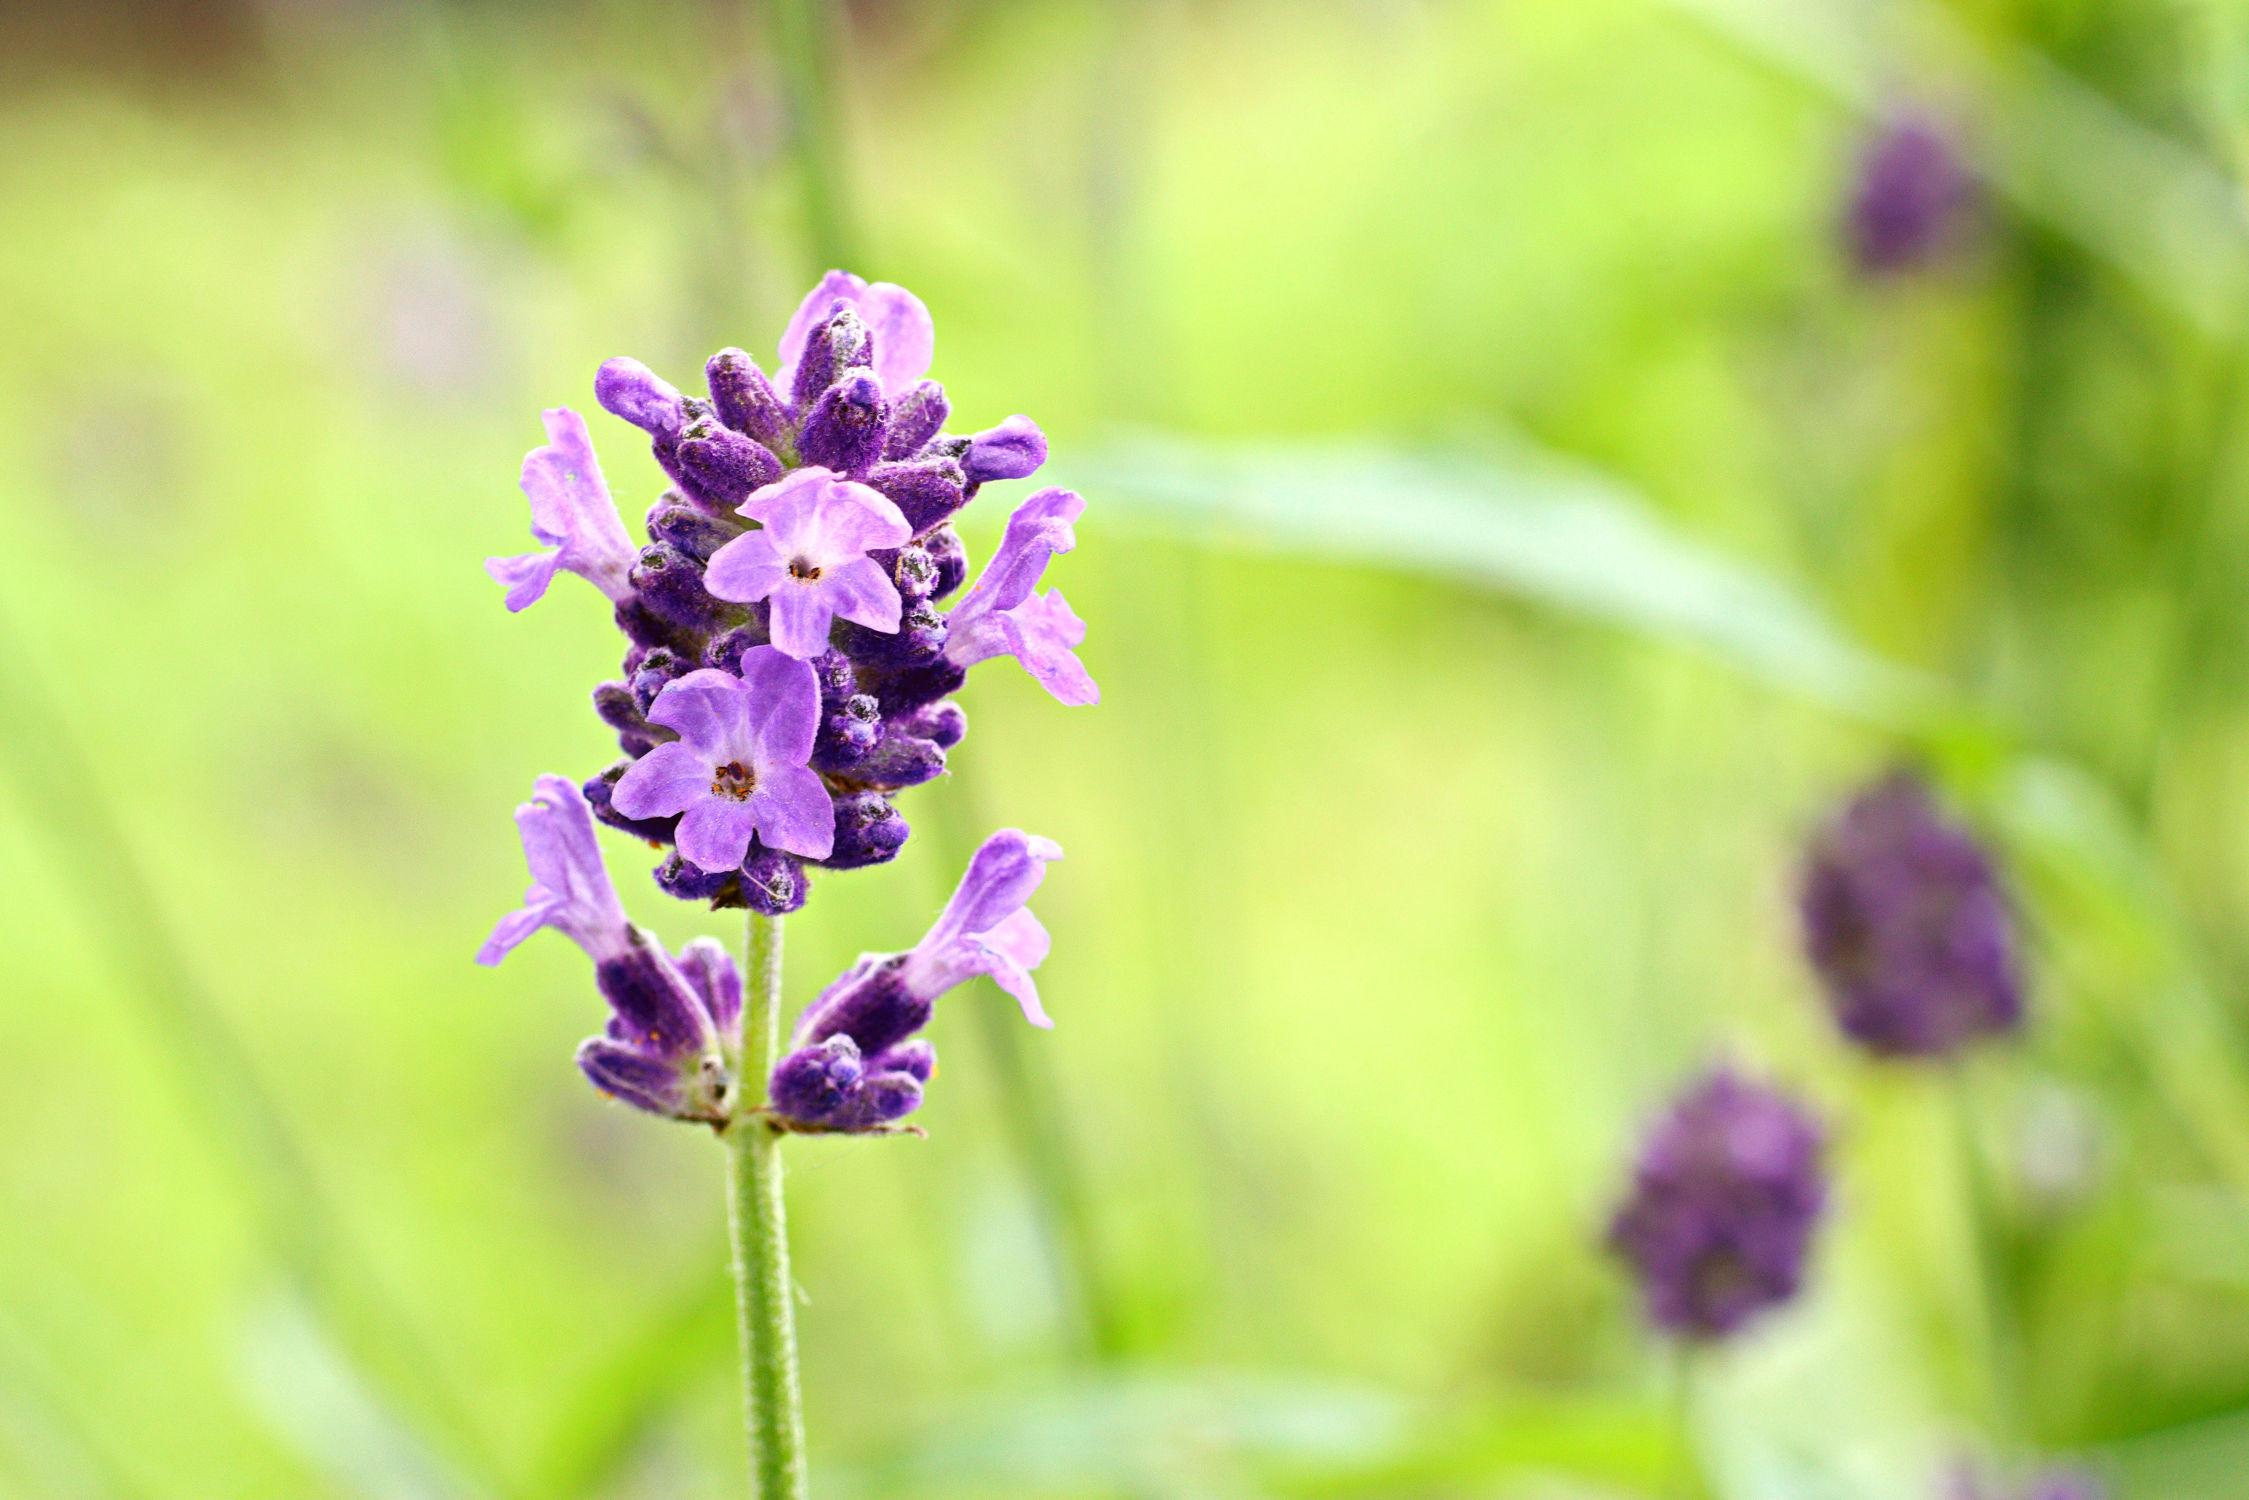 Bild mit Natur, Pflanzen, Blumen, Lavendel, Blume, Pflanze, Makro, blüte, Lavandula